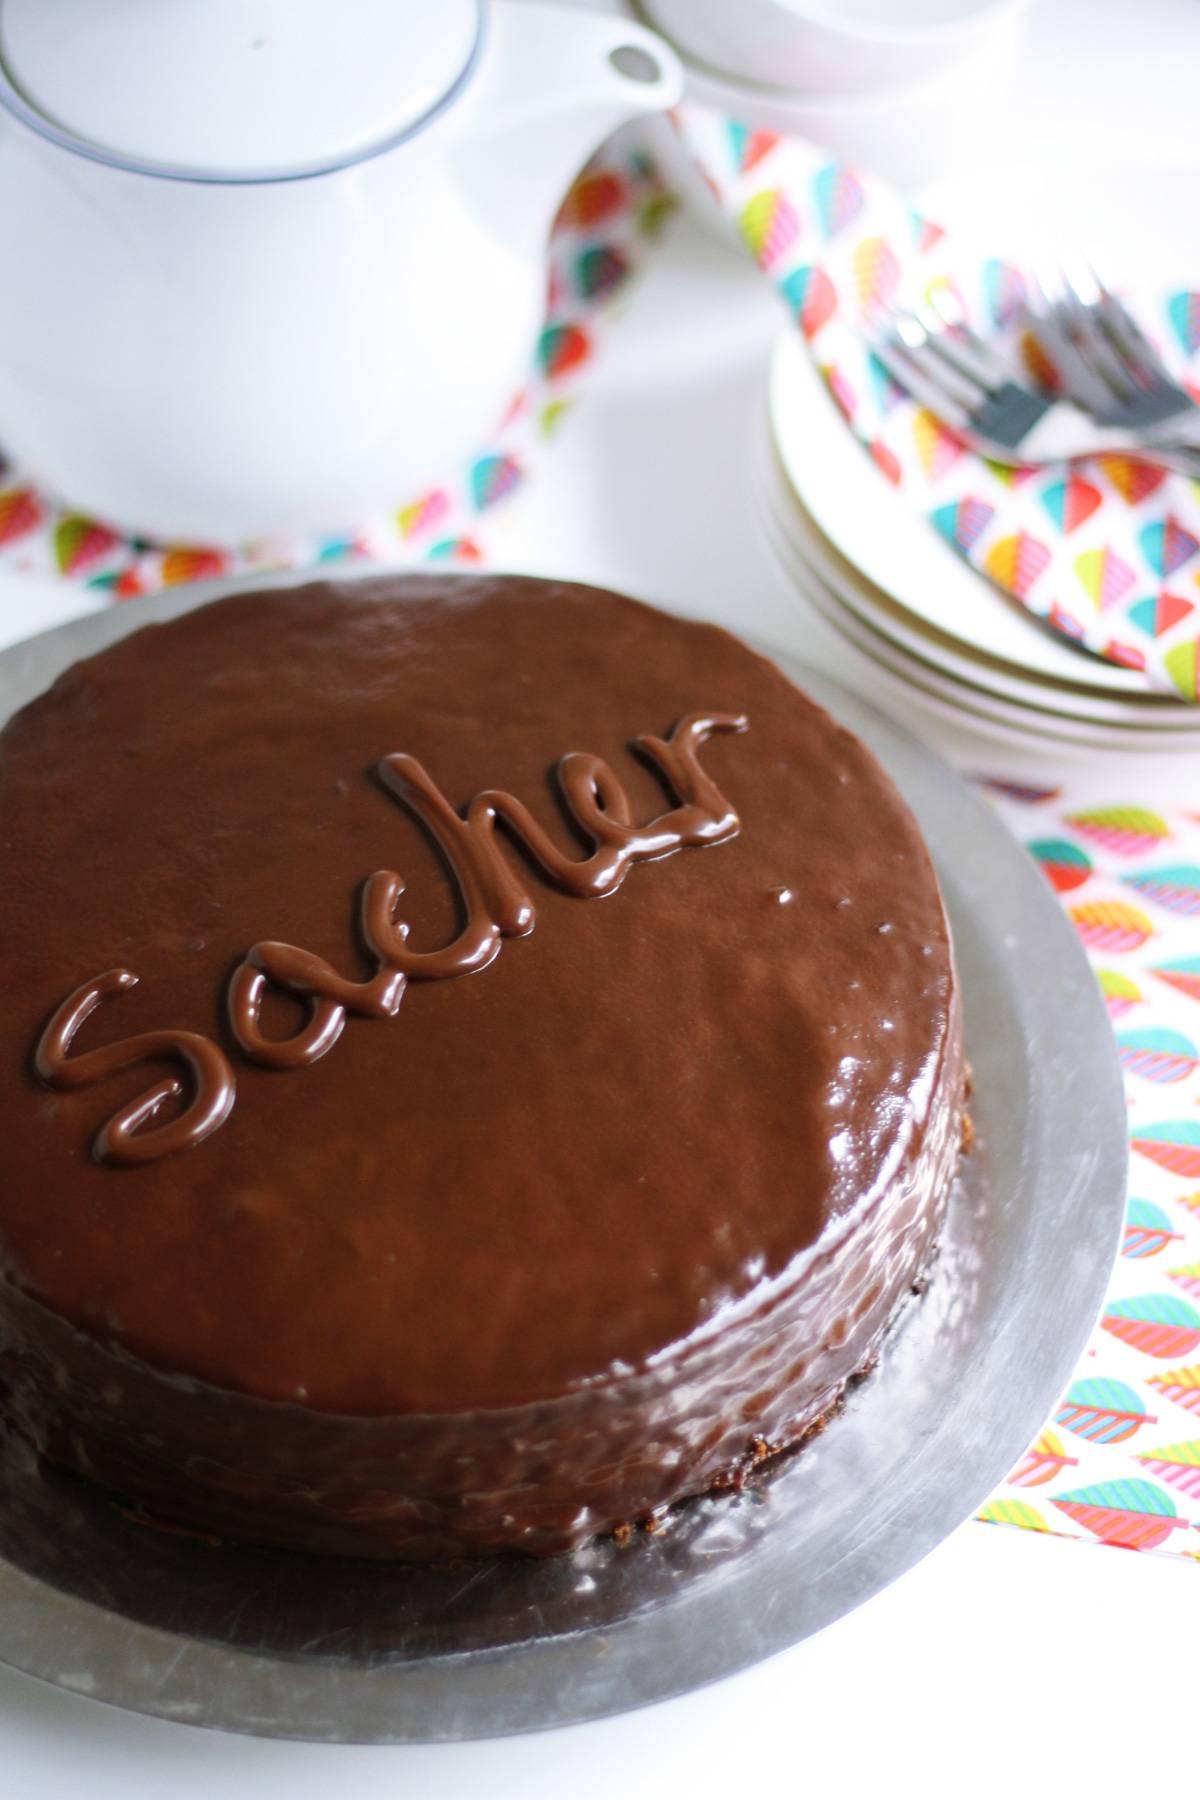 Čokoladna fantazija: Sacher torta s domaćim pekmezom